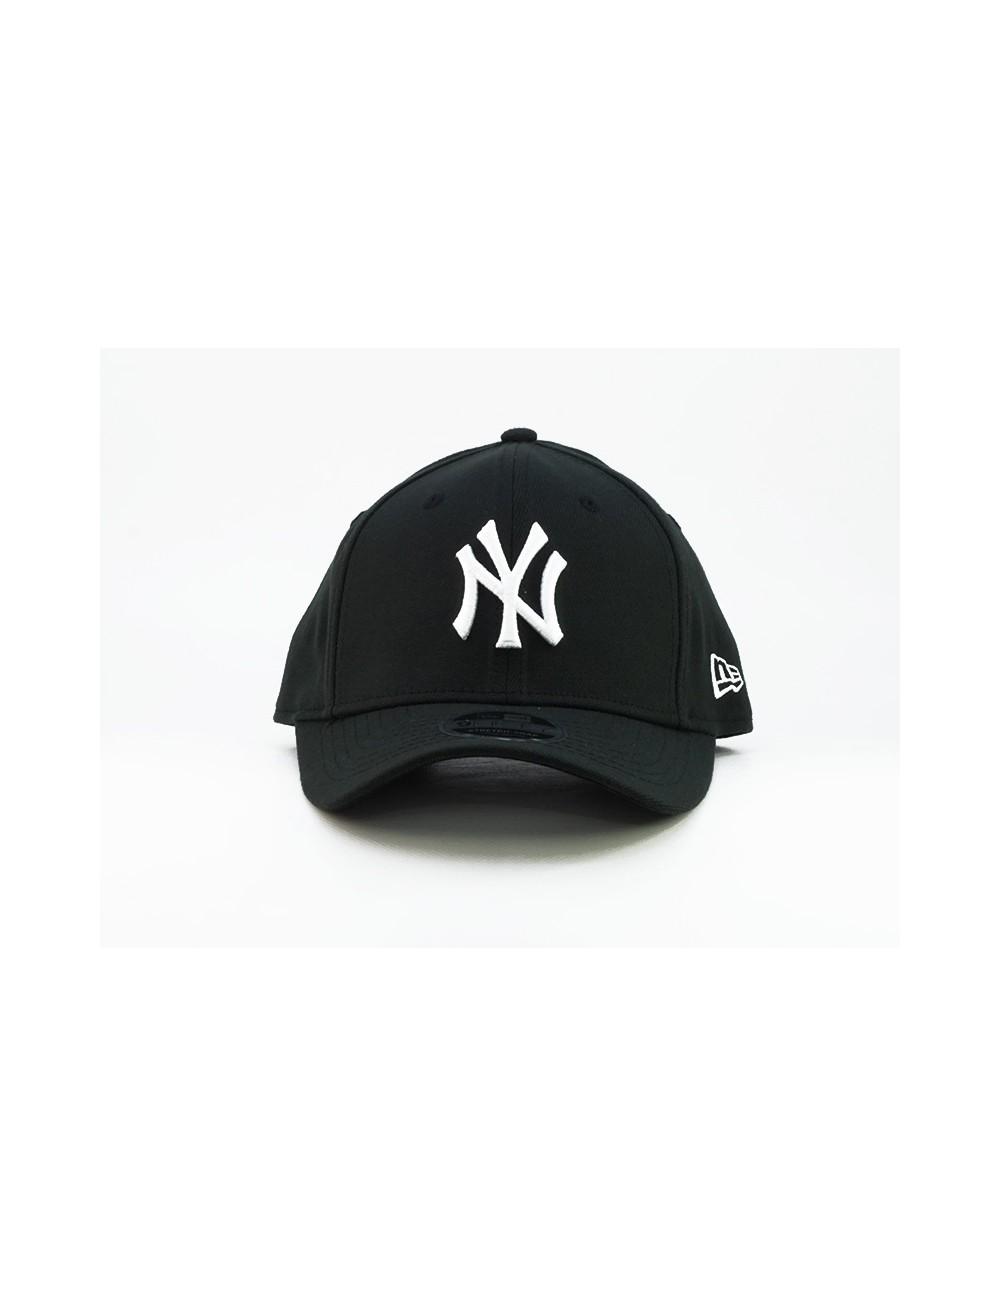 NEW ERA STRECH SNAP 9FIFTY NEW YORK YANKEES